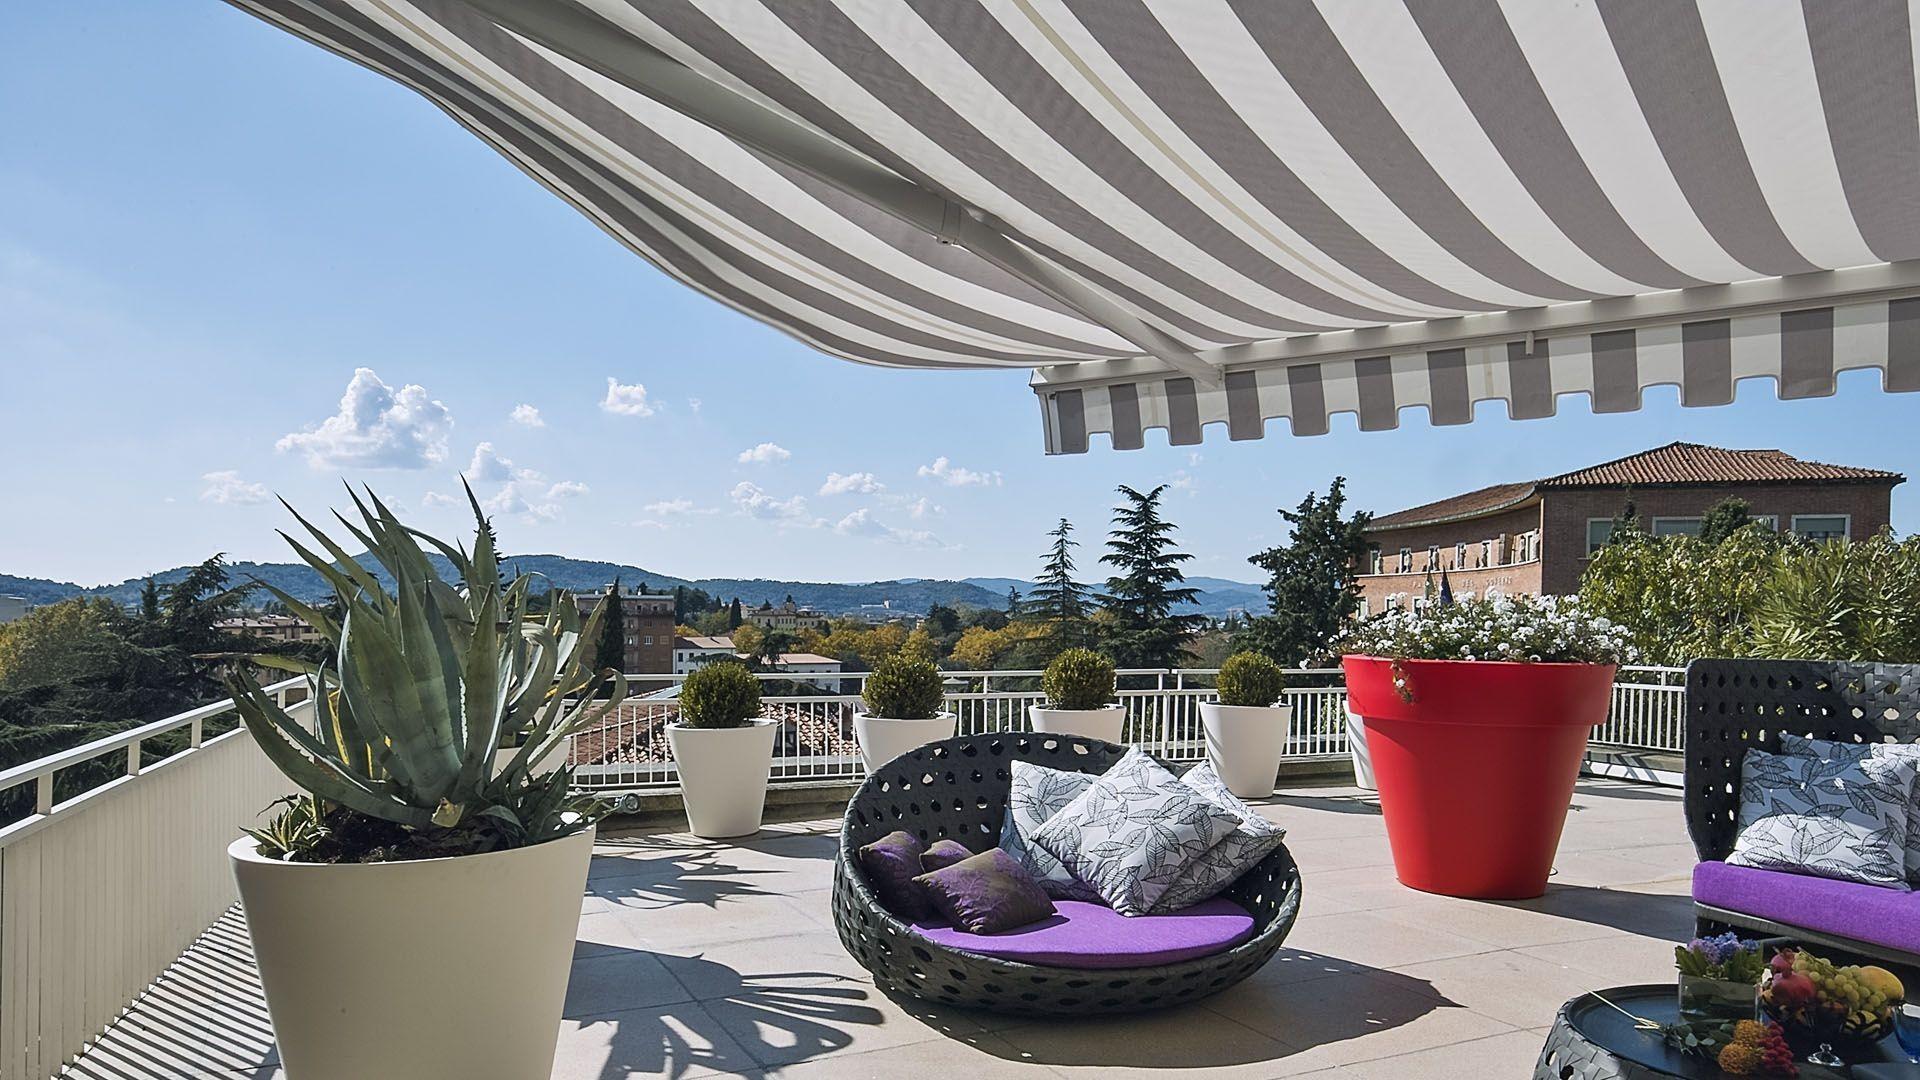 Toldos para terrazas en Sitges